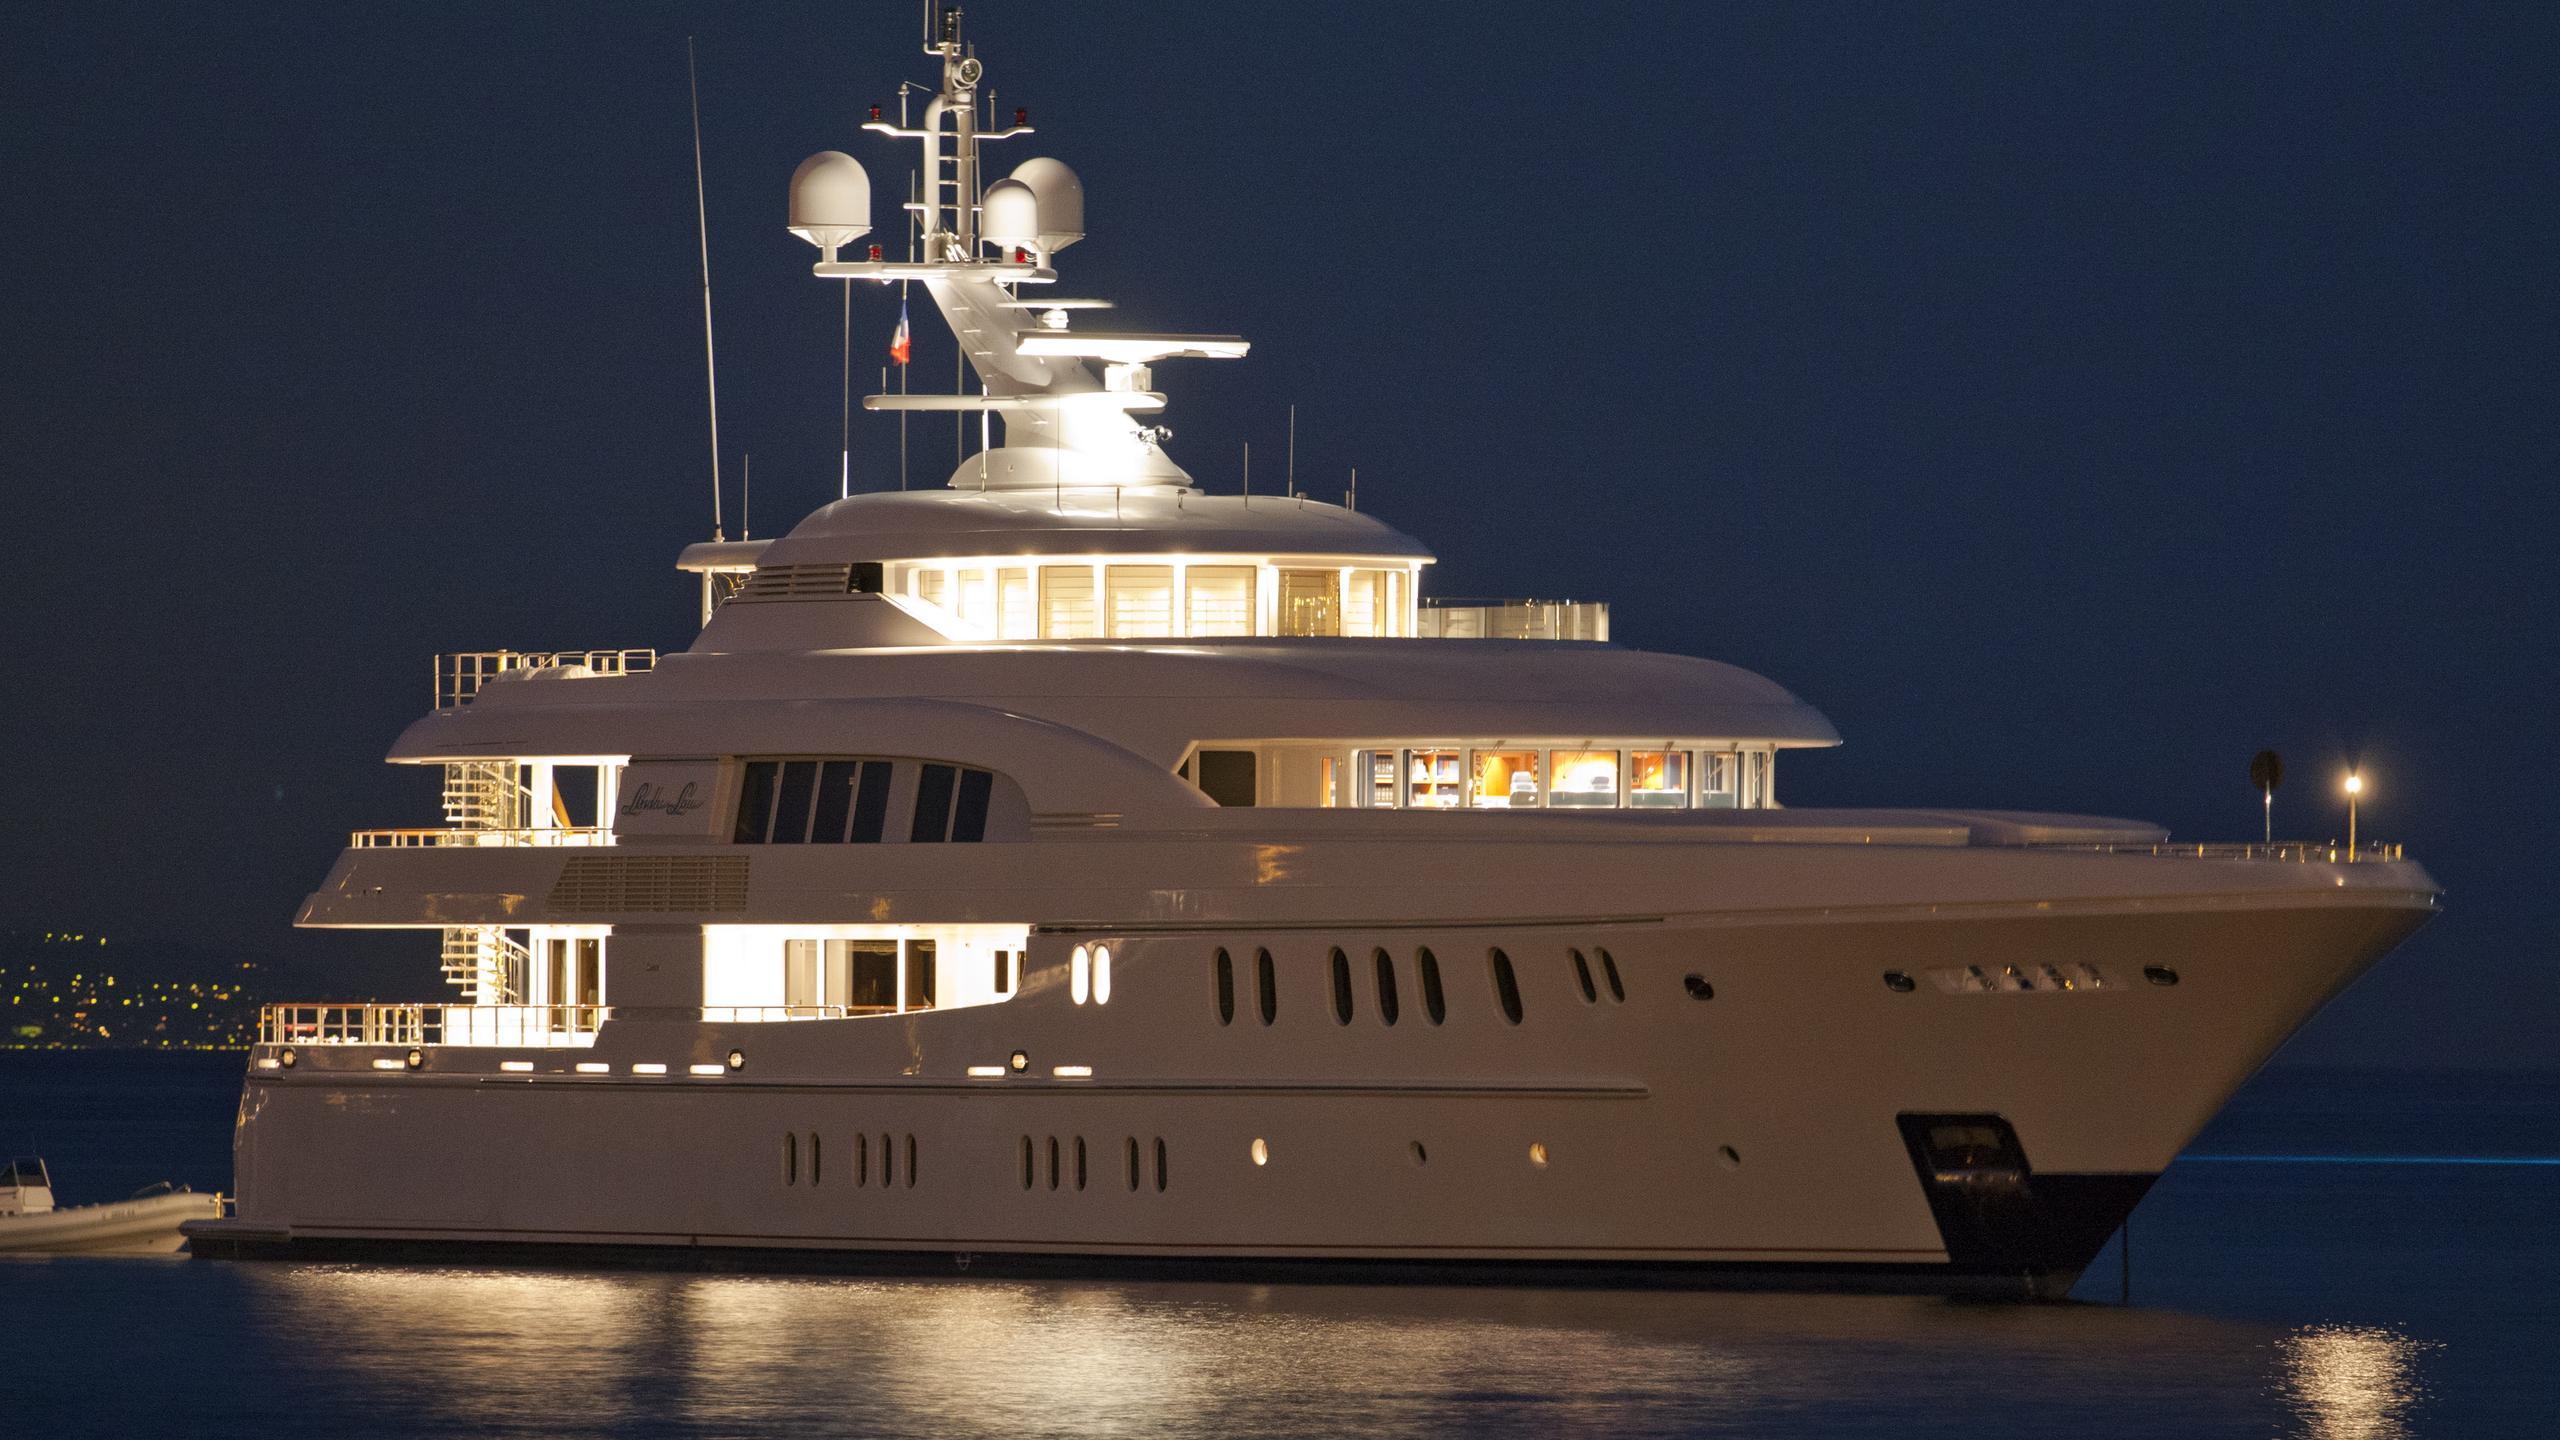 podium-motor-yacht-lurssen-2006-60m-by-night